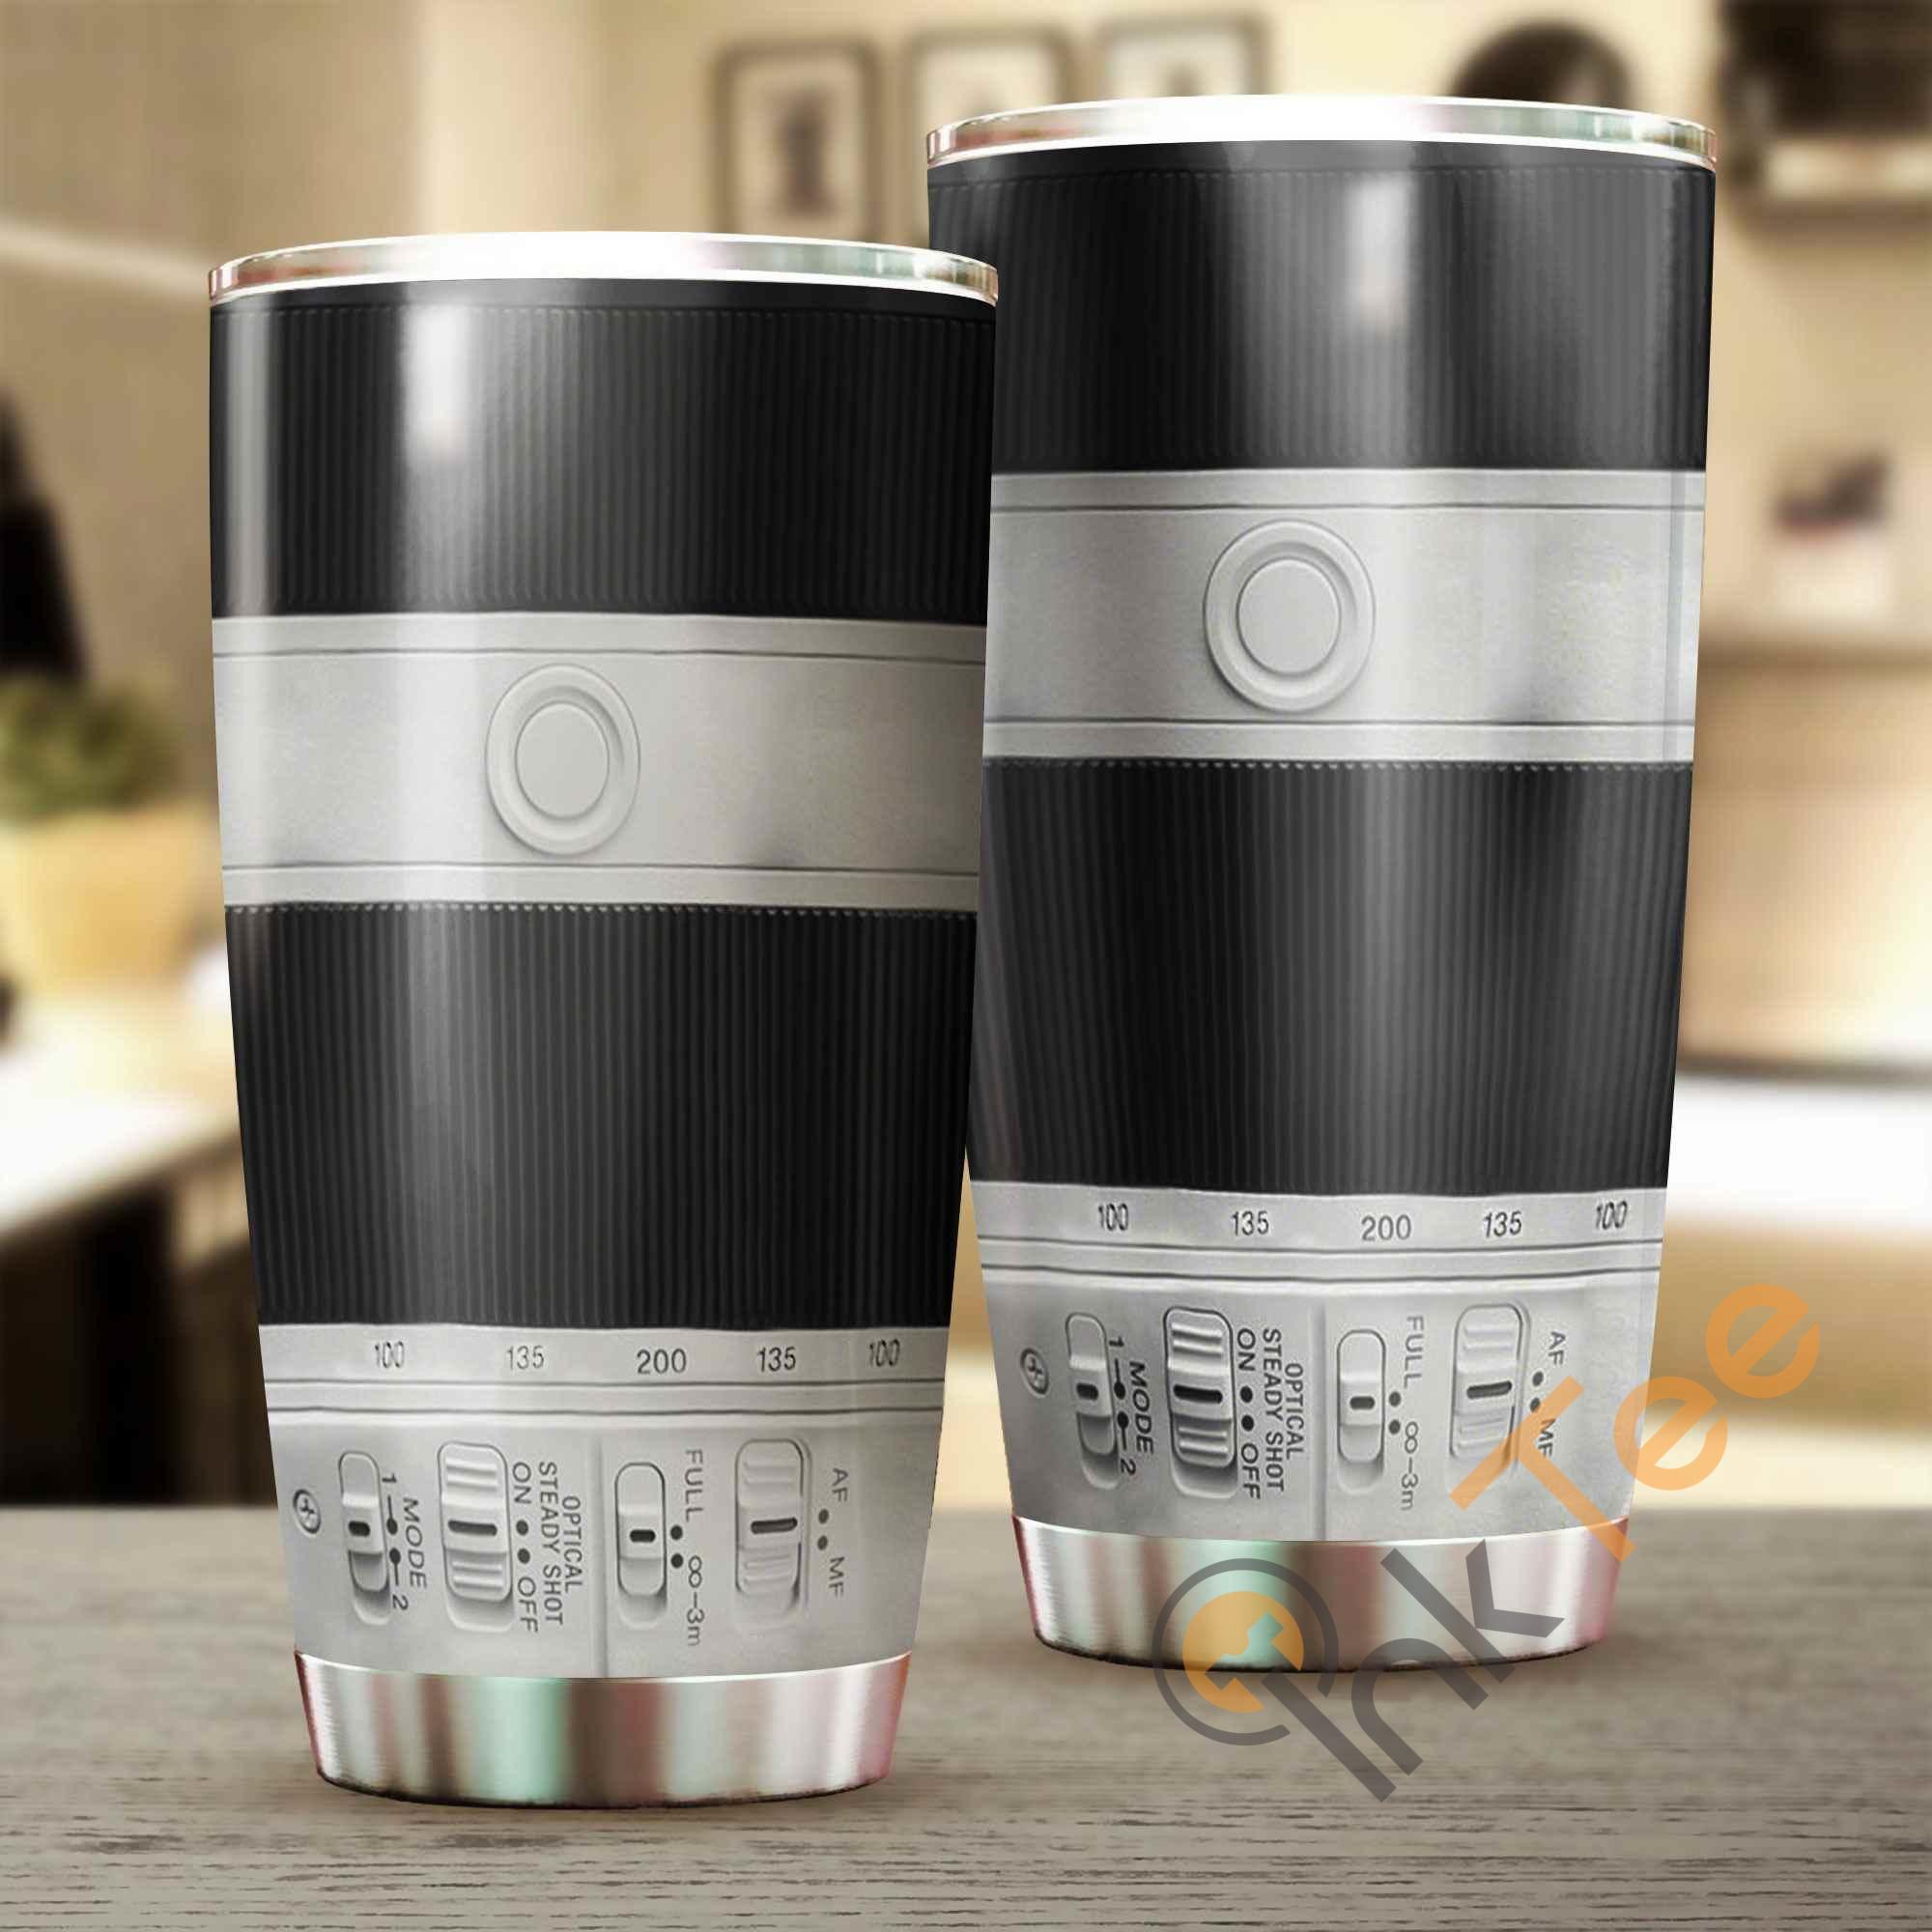 Camera Lens Top Amazon Best Seller Sku 3392 Stainless Steel Tumbler